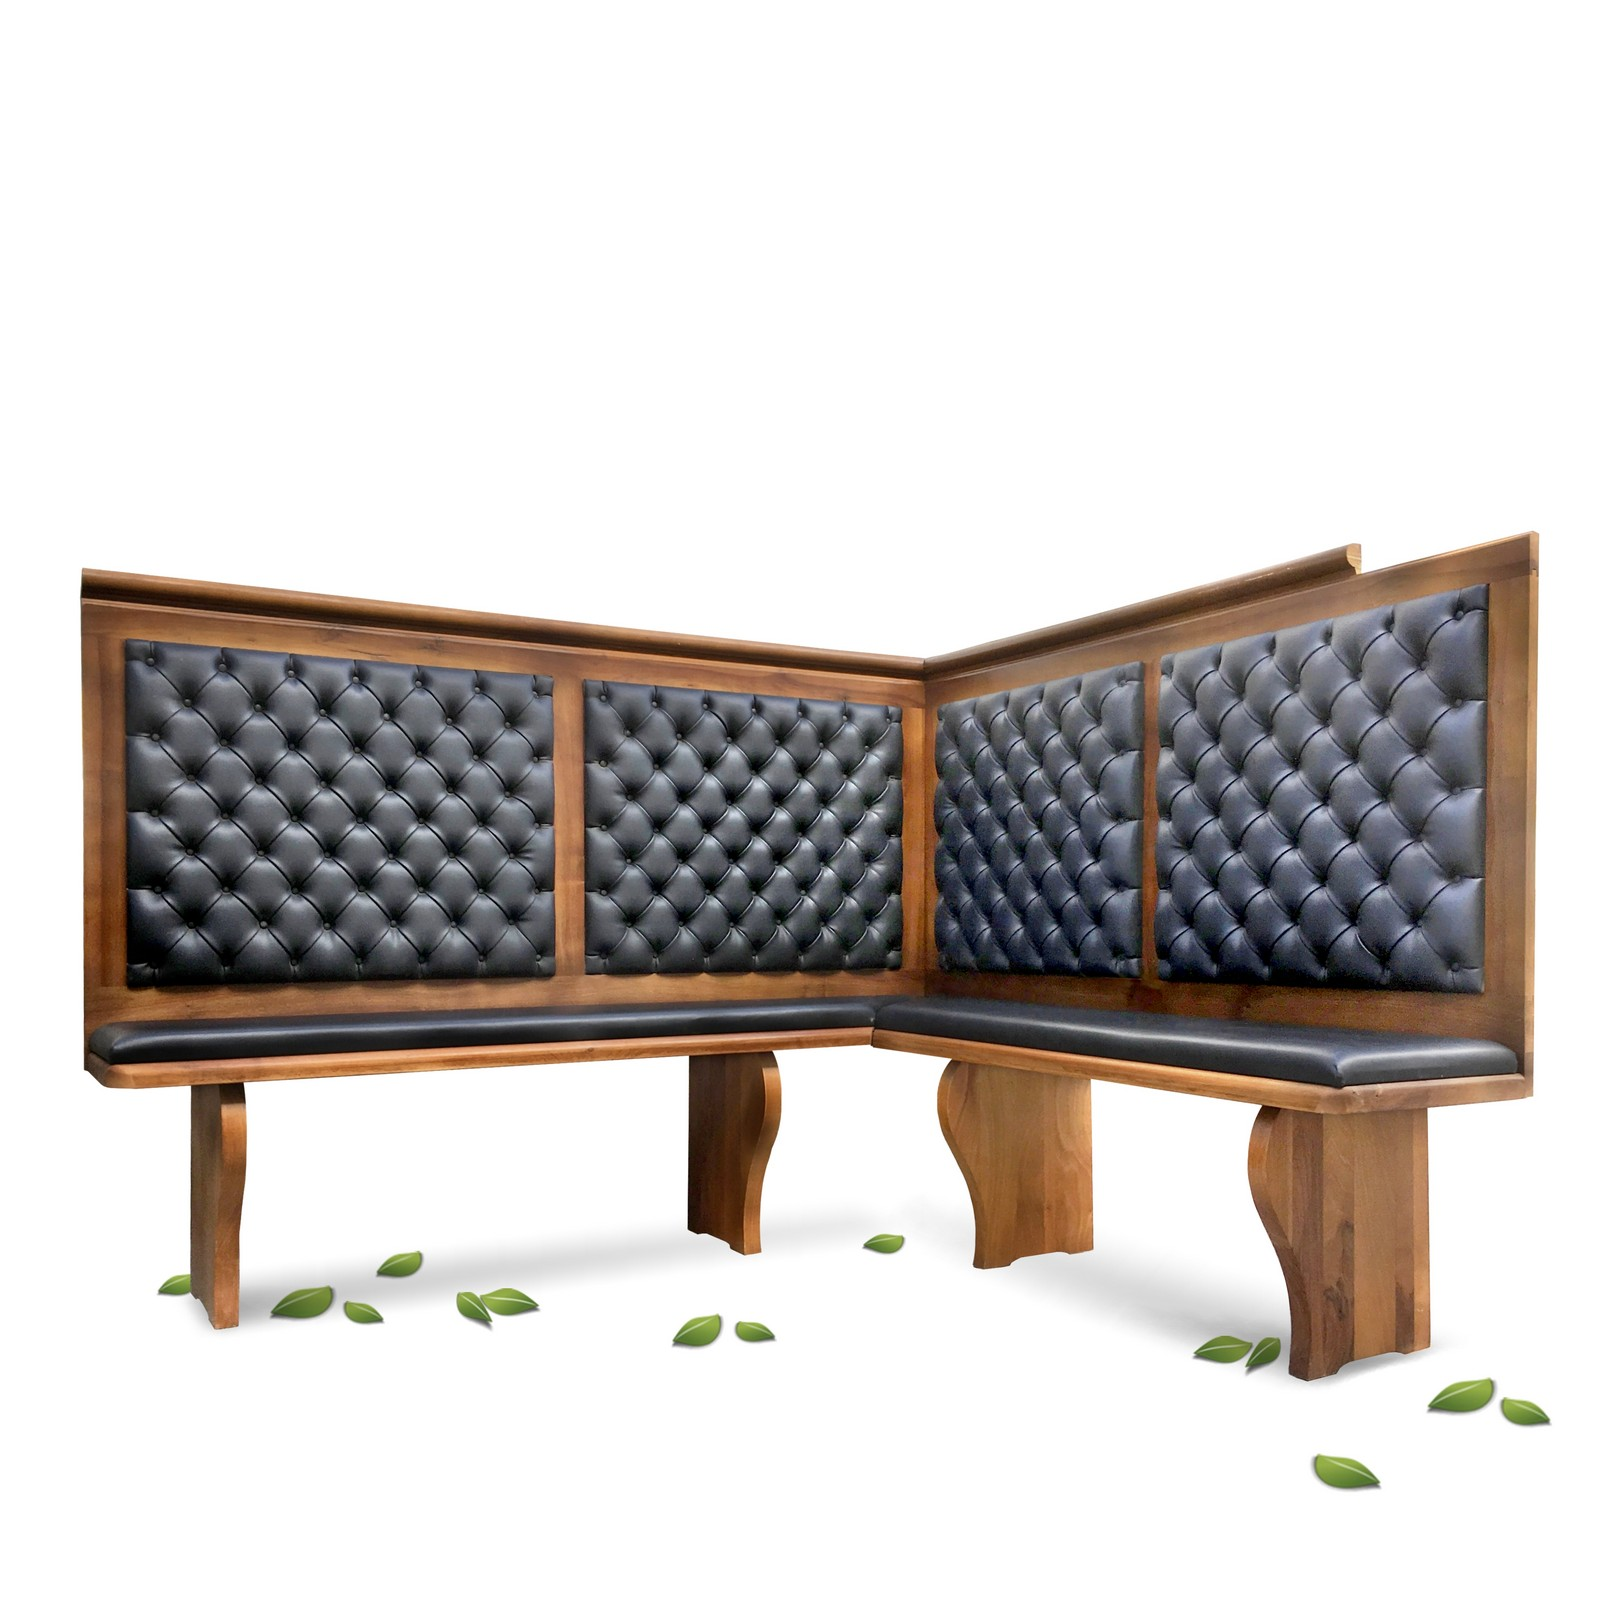 Full Size of Bibliothek Sitzbank Eckbank Chesterfield Holz Leder Design Küche Sitzbank Küche